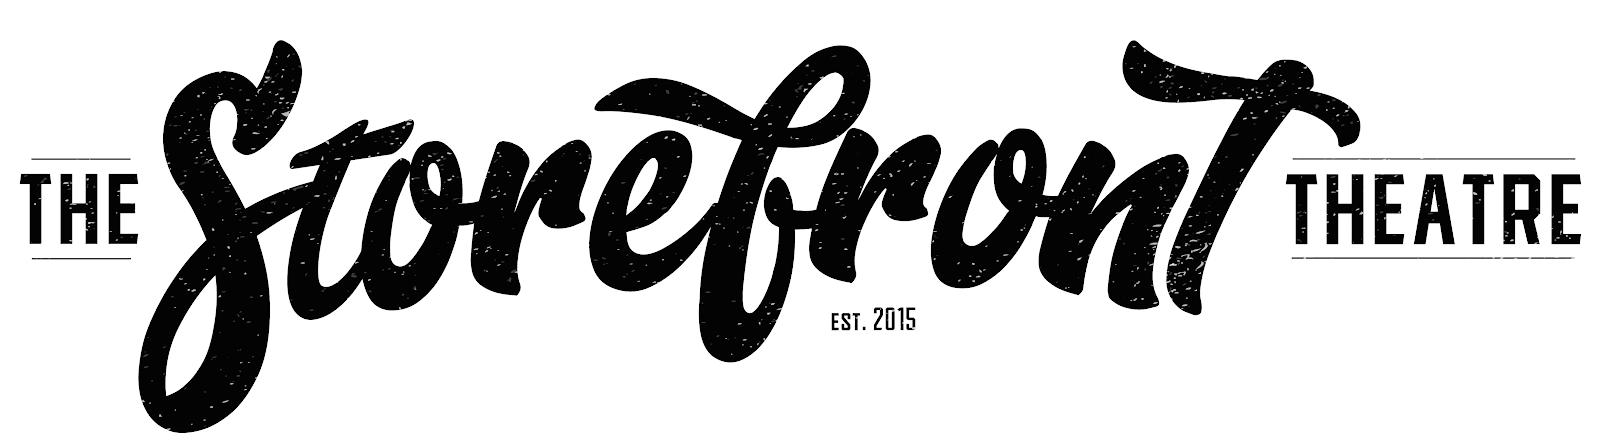 storefront-cape-friday-night-live-logo